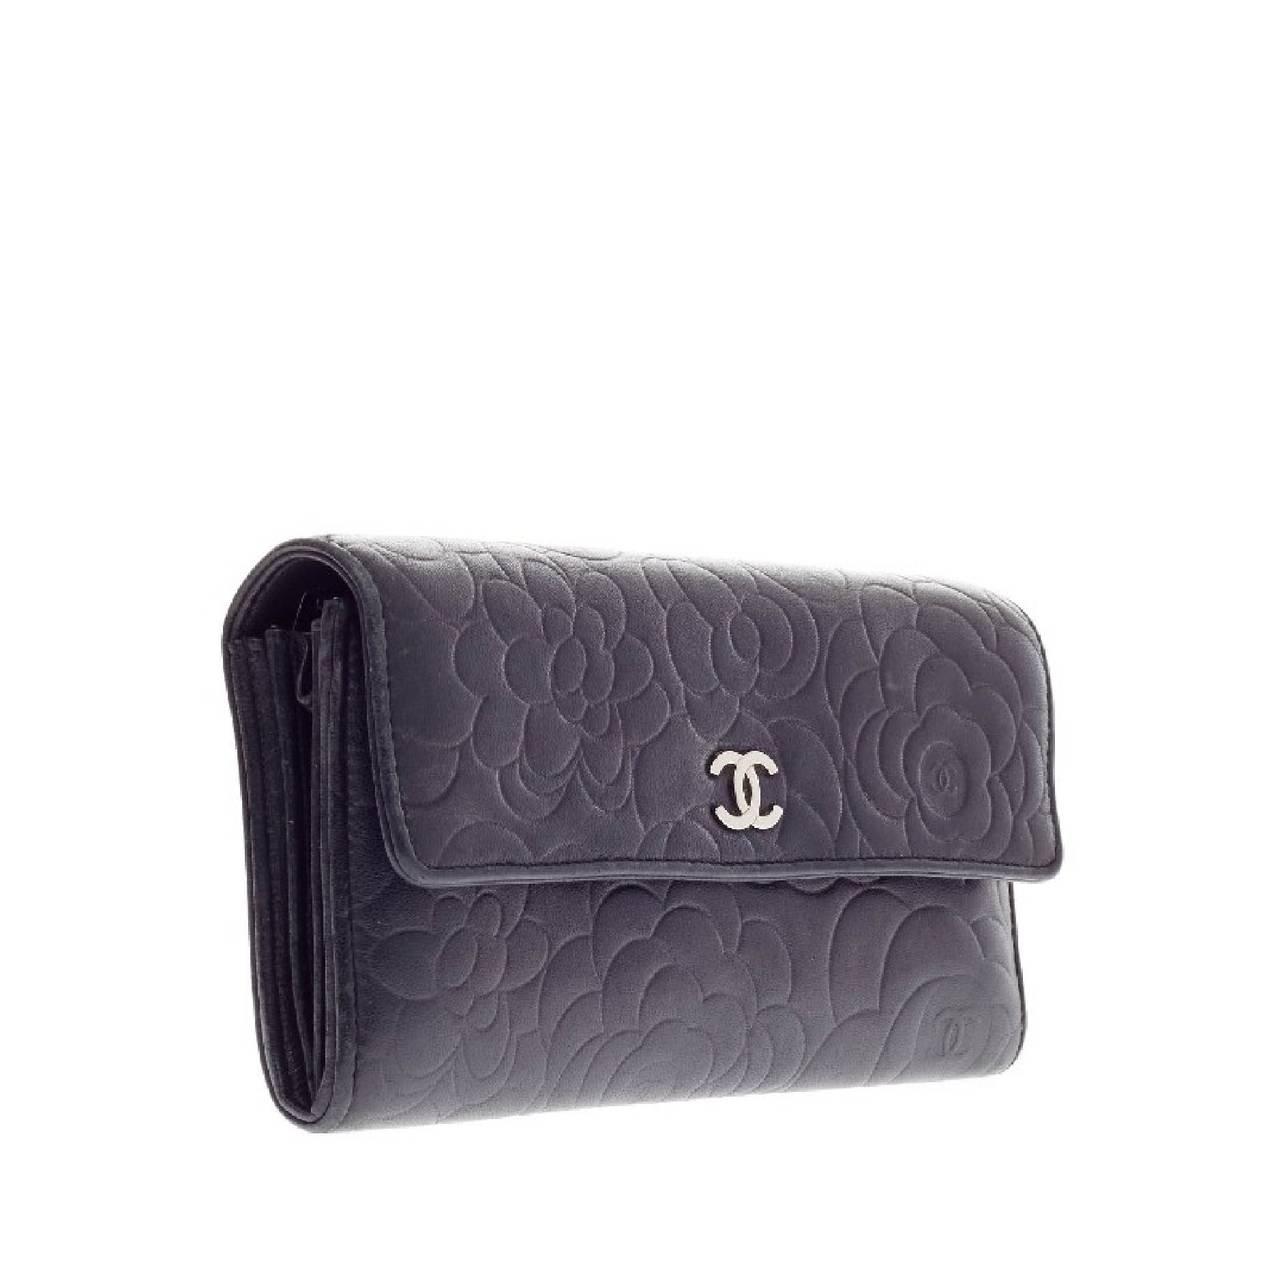 Chanel Flap Wallet Camellia Lambskin Long at 1stdibs